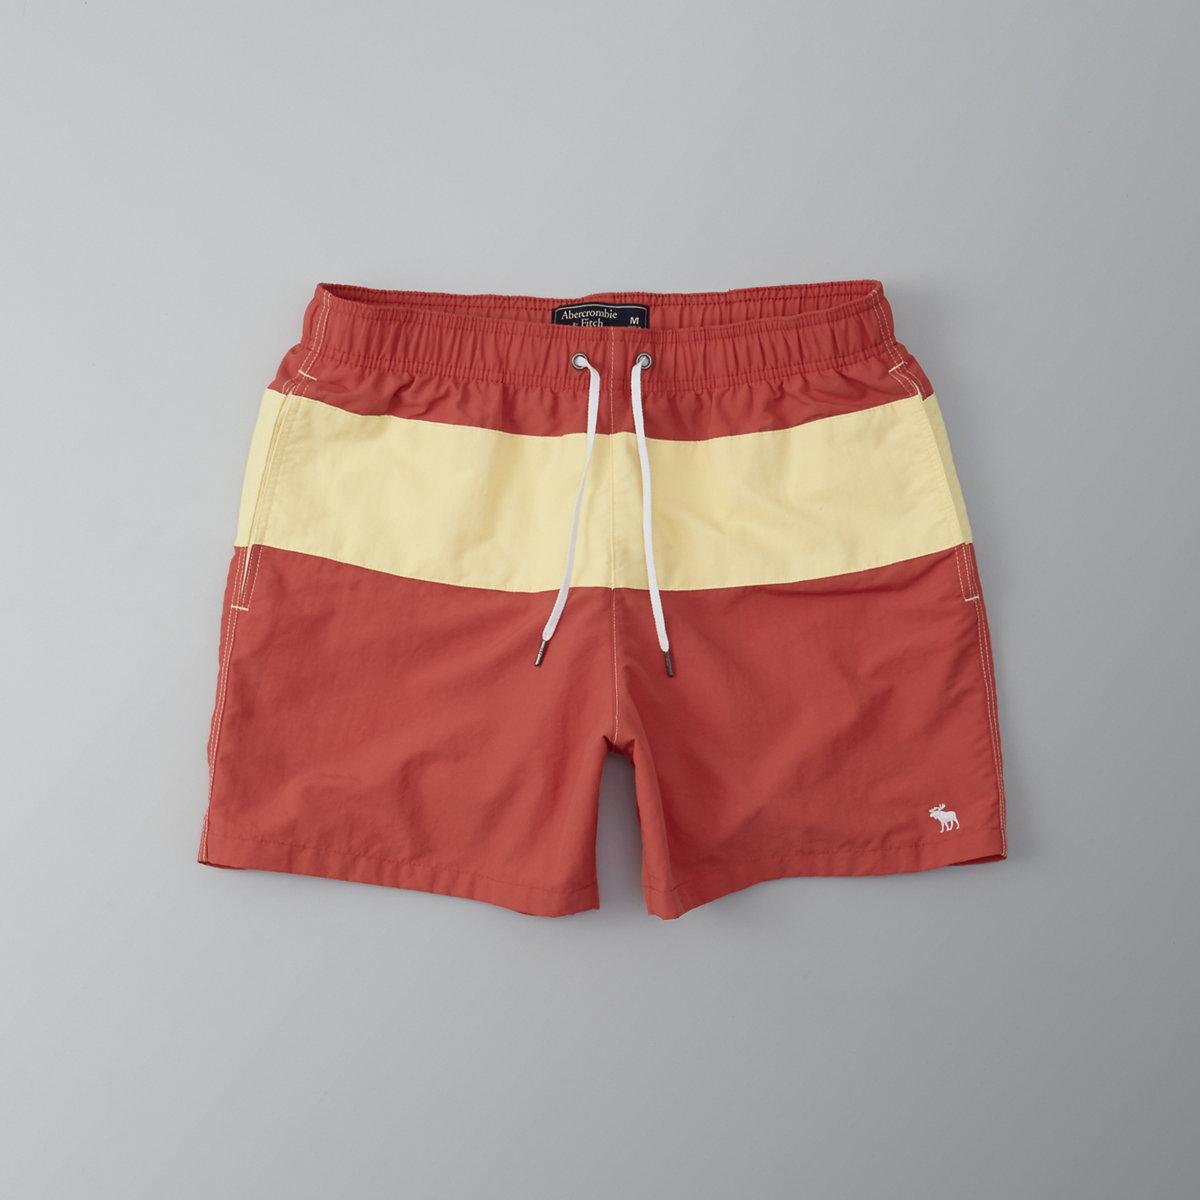 5'' Guard Fit Swim Shorts